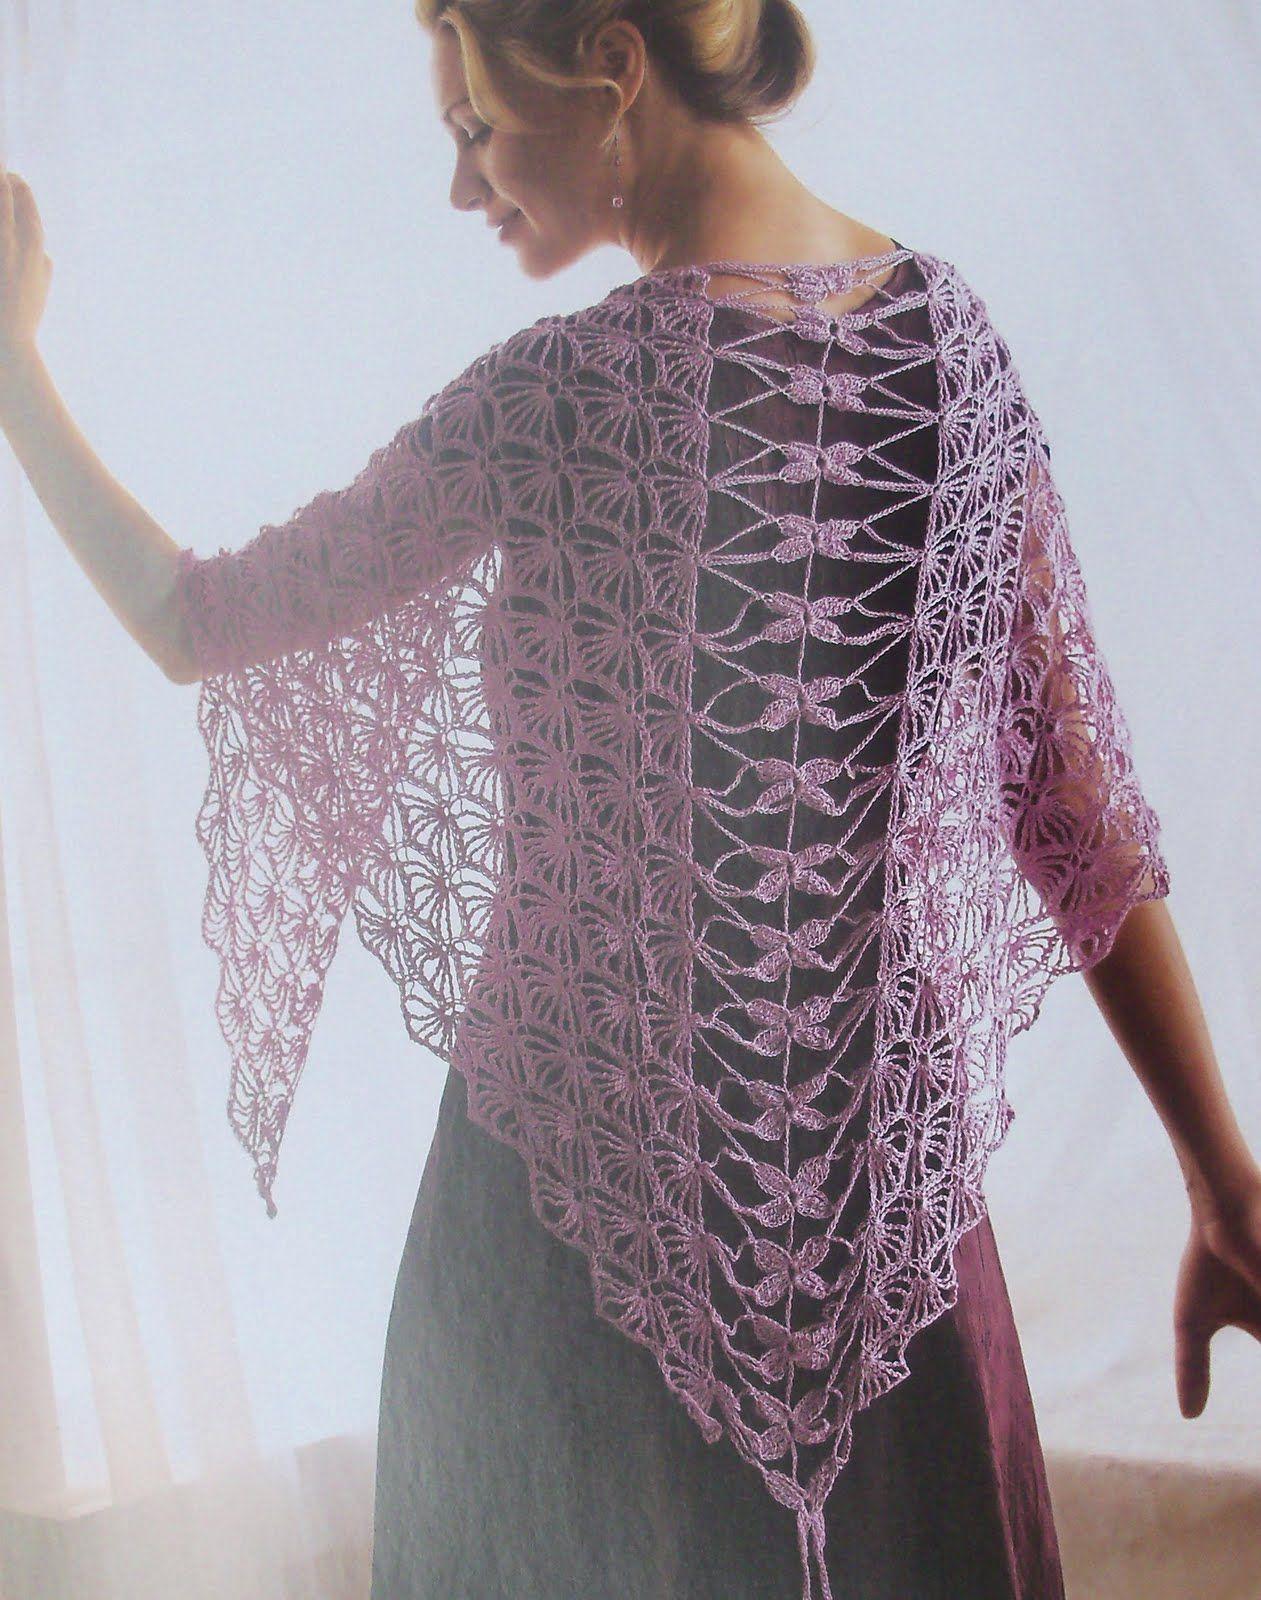 Crochet shawl patterns for beginners crochet triangle shawl crochet shawl patterns for beginners crochet triangle shawl patterns for beginners bankloansurffo Choice Image